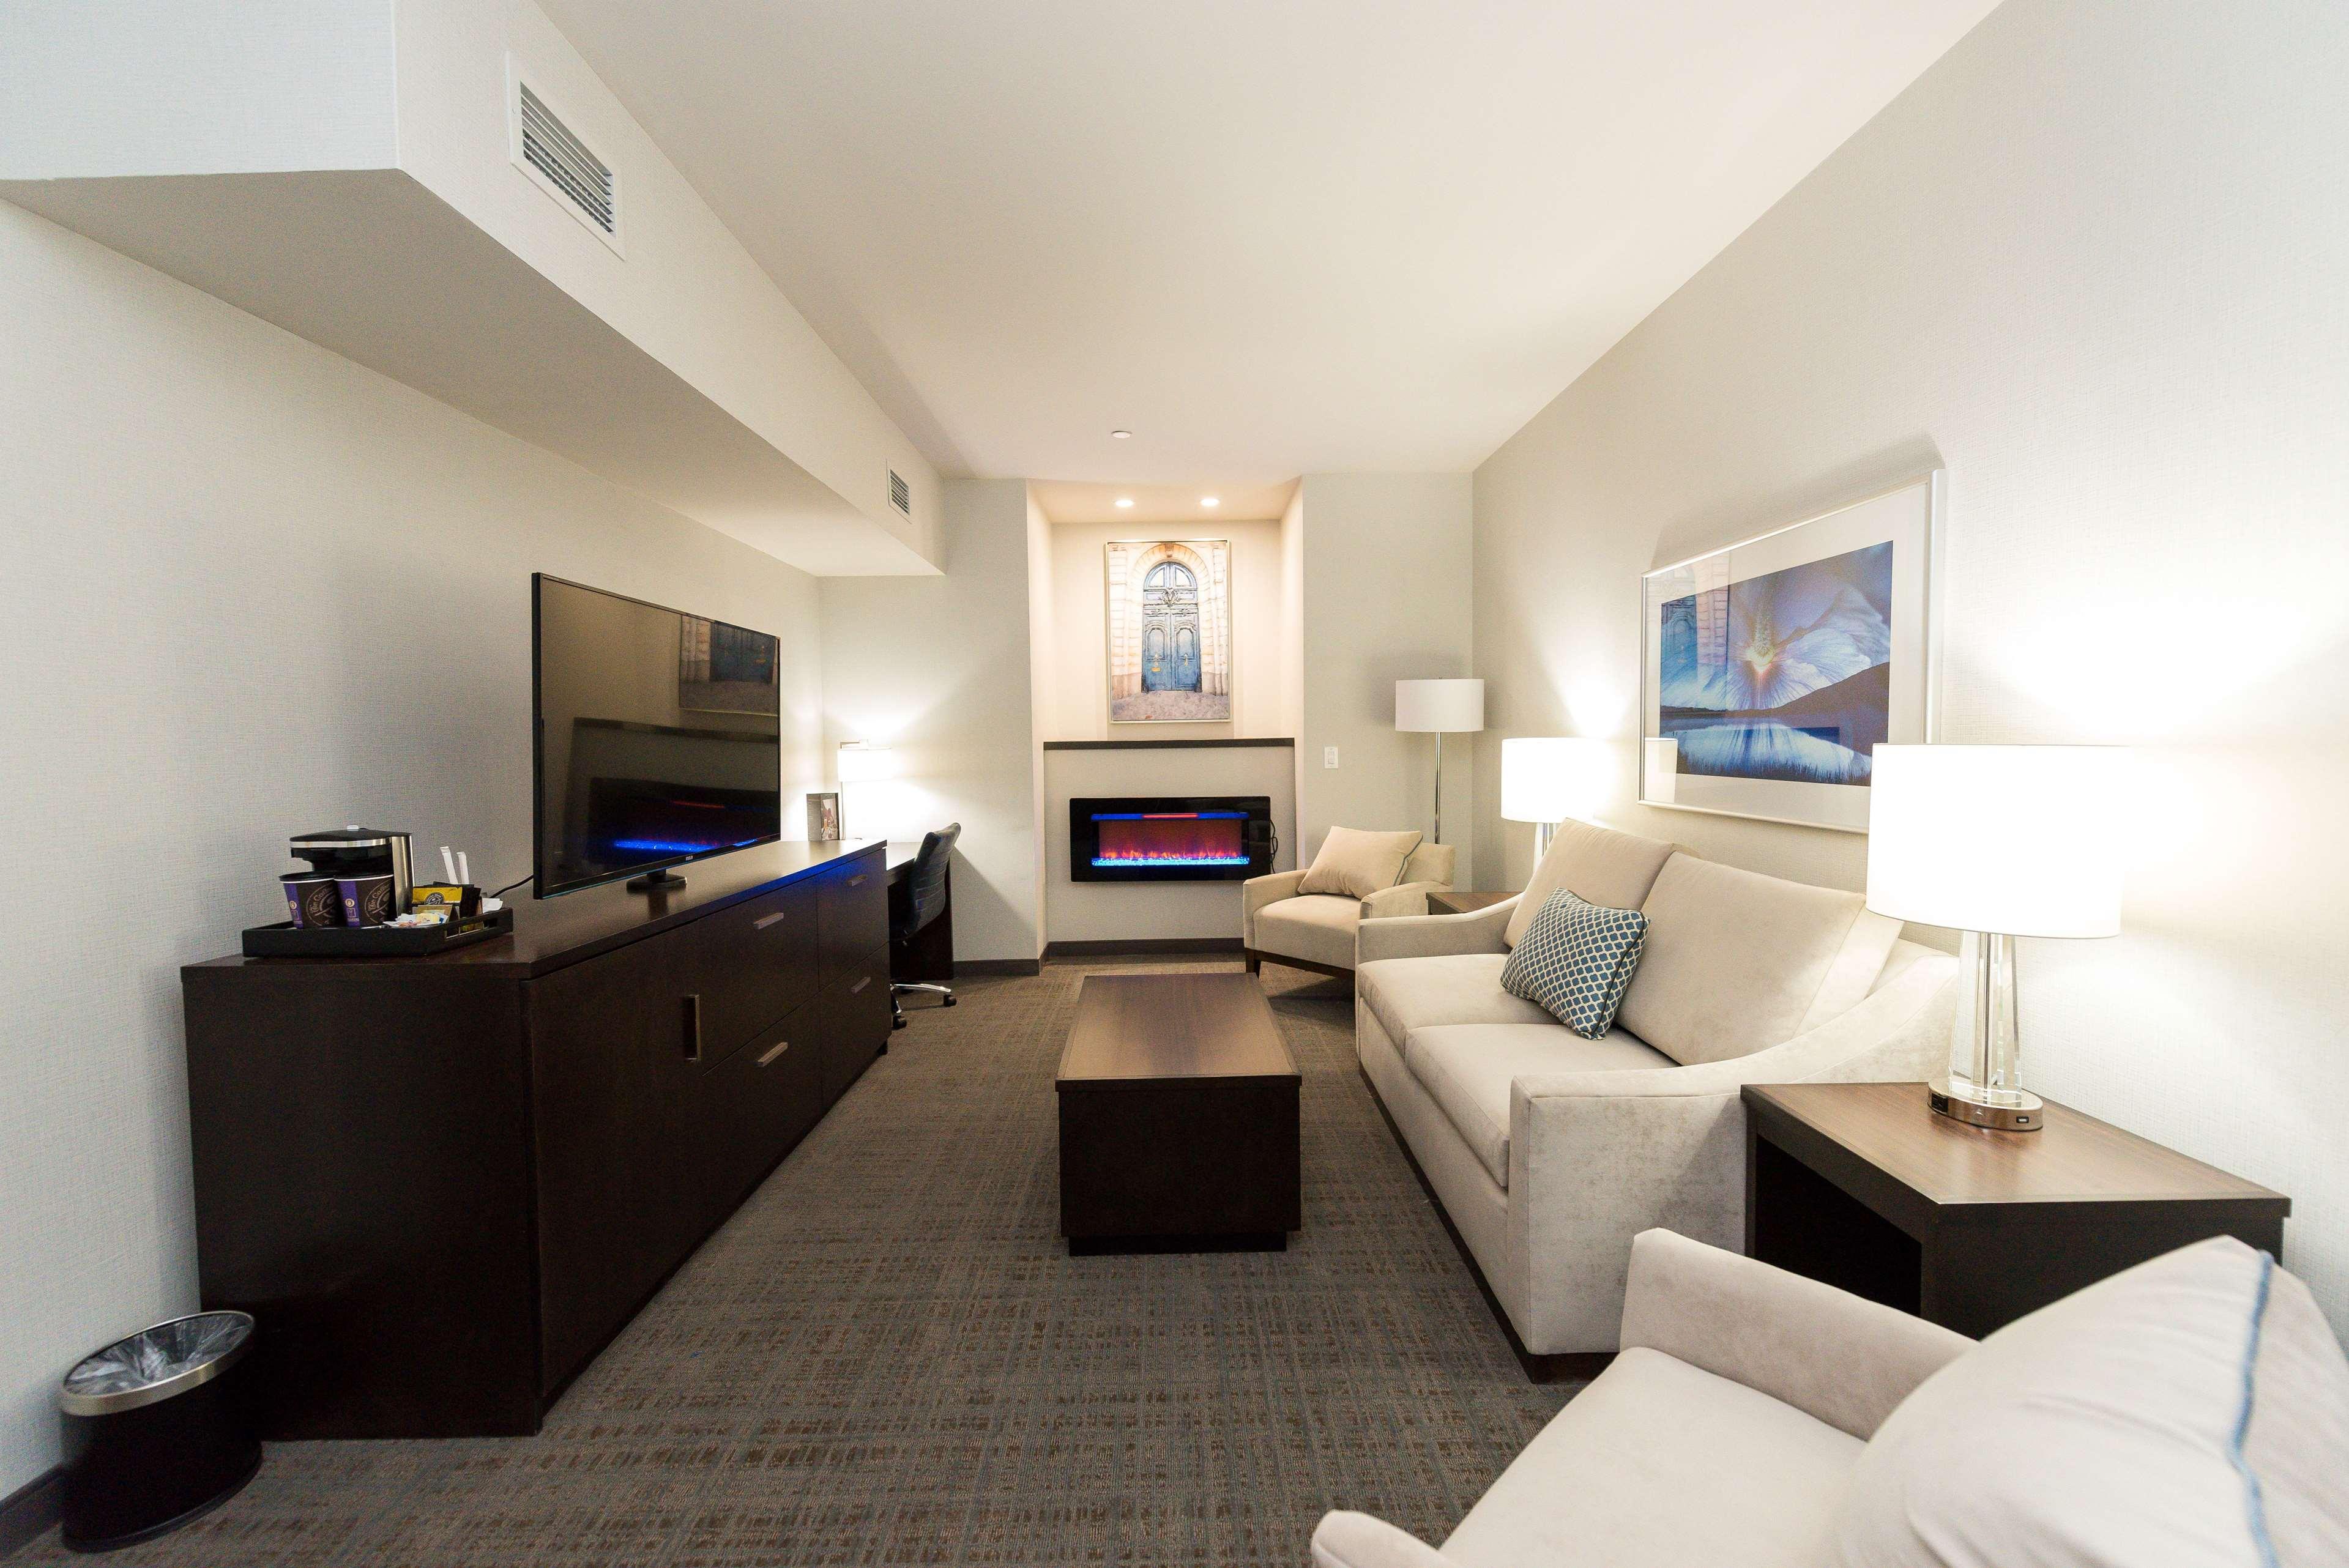 Hilton Scranton & Conference Center image 7